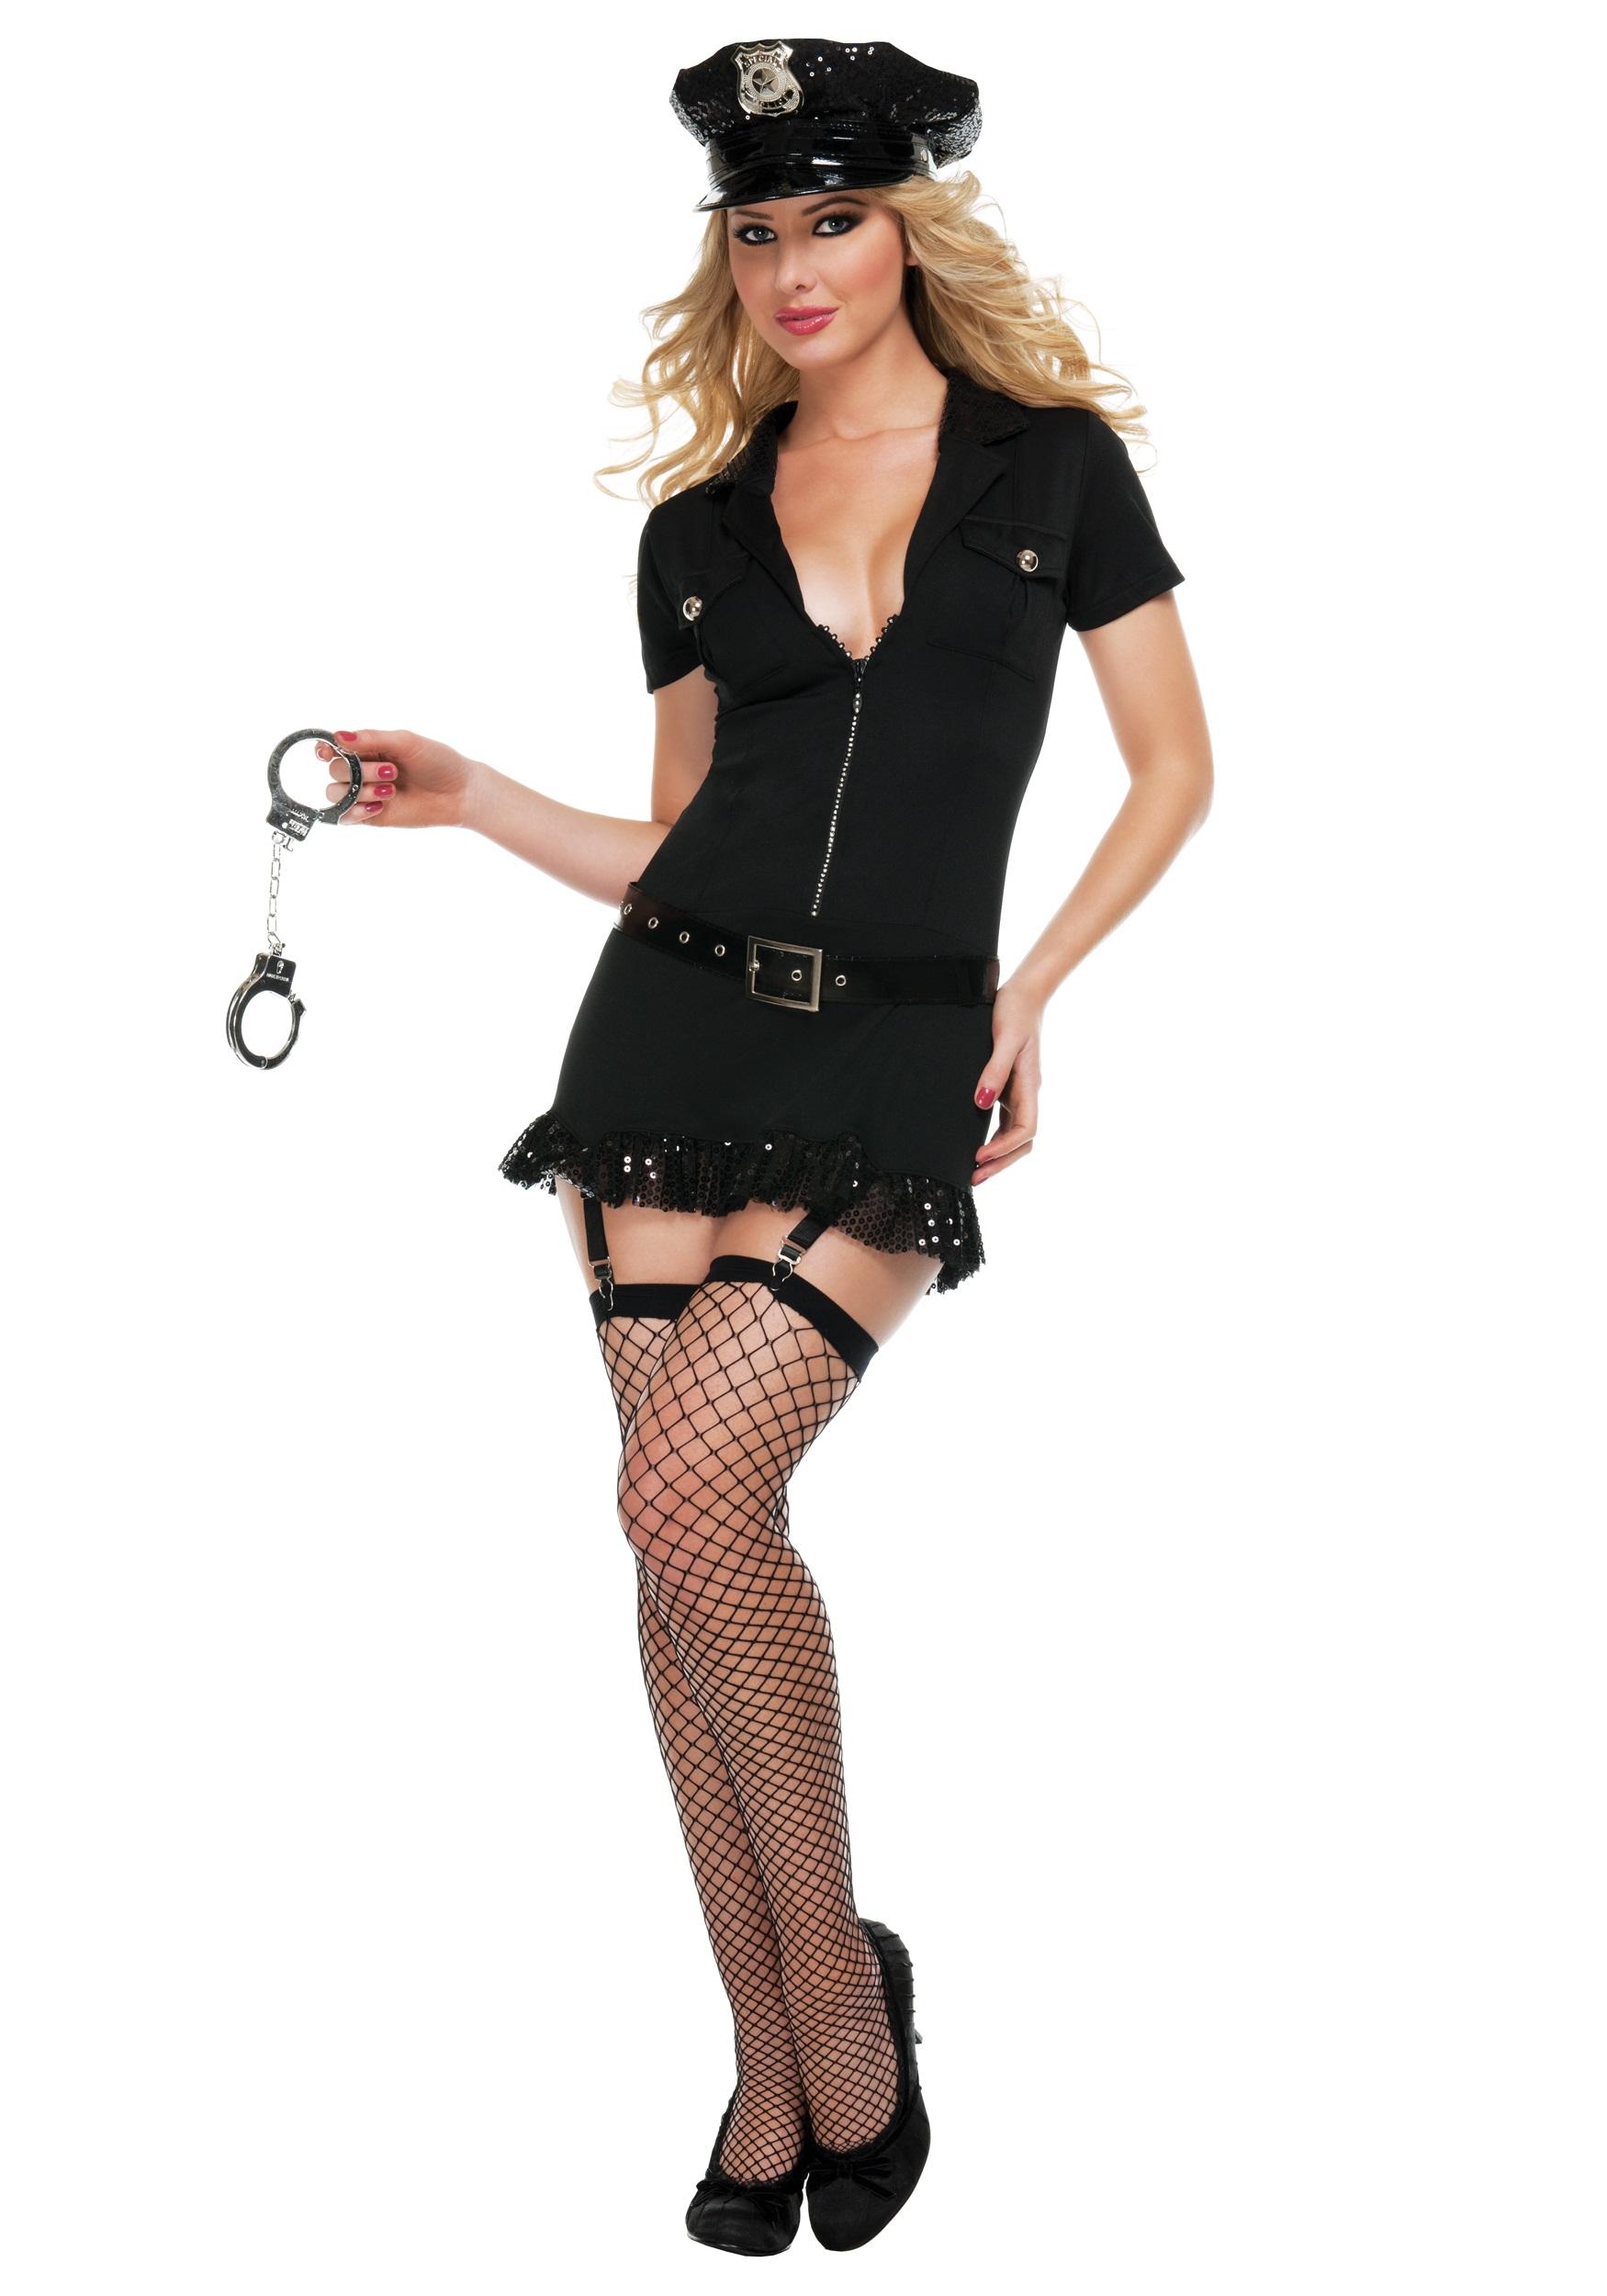 Frisk Me Please Cop Costume  sc 1 st  Halloween Costumes & Frisk Me Please Cop Costume - Halloween Costumes